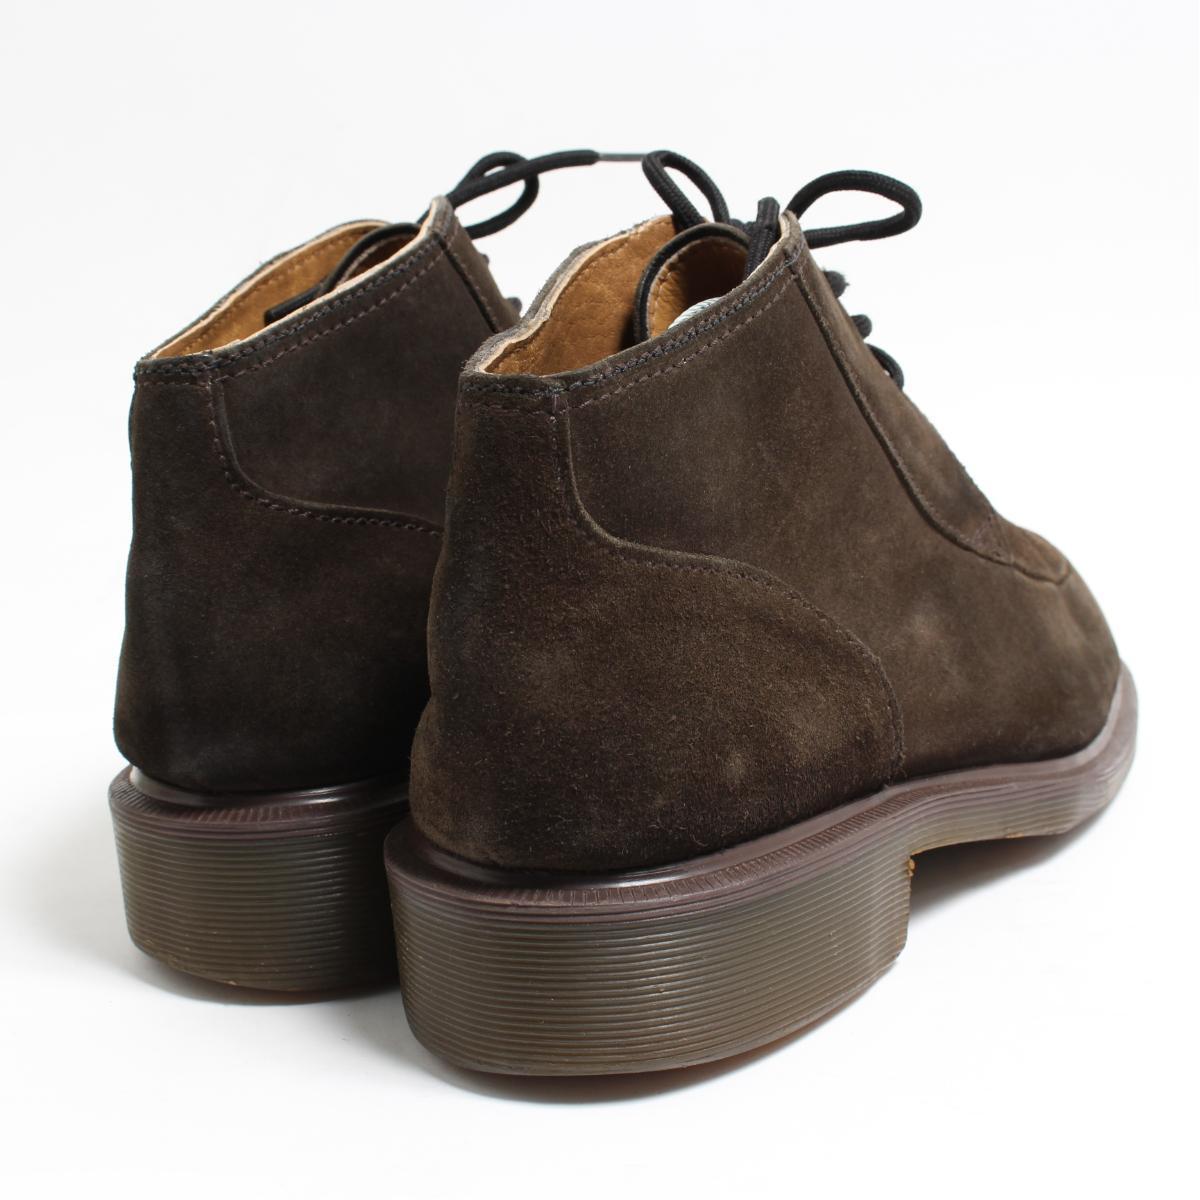 Dr. Martens★ブーツ☆Carey Heeled Boots【関税送料込】